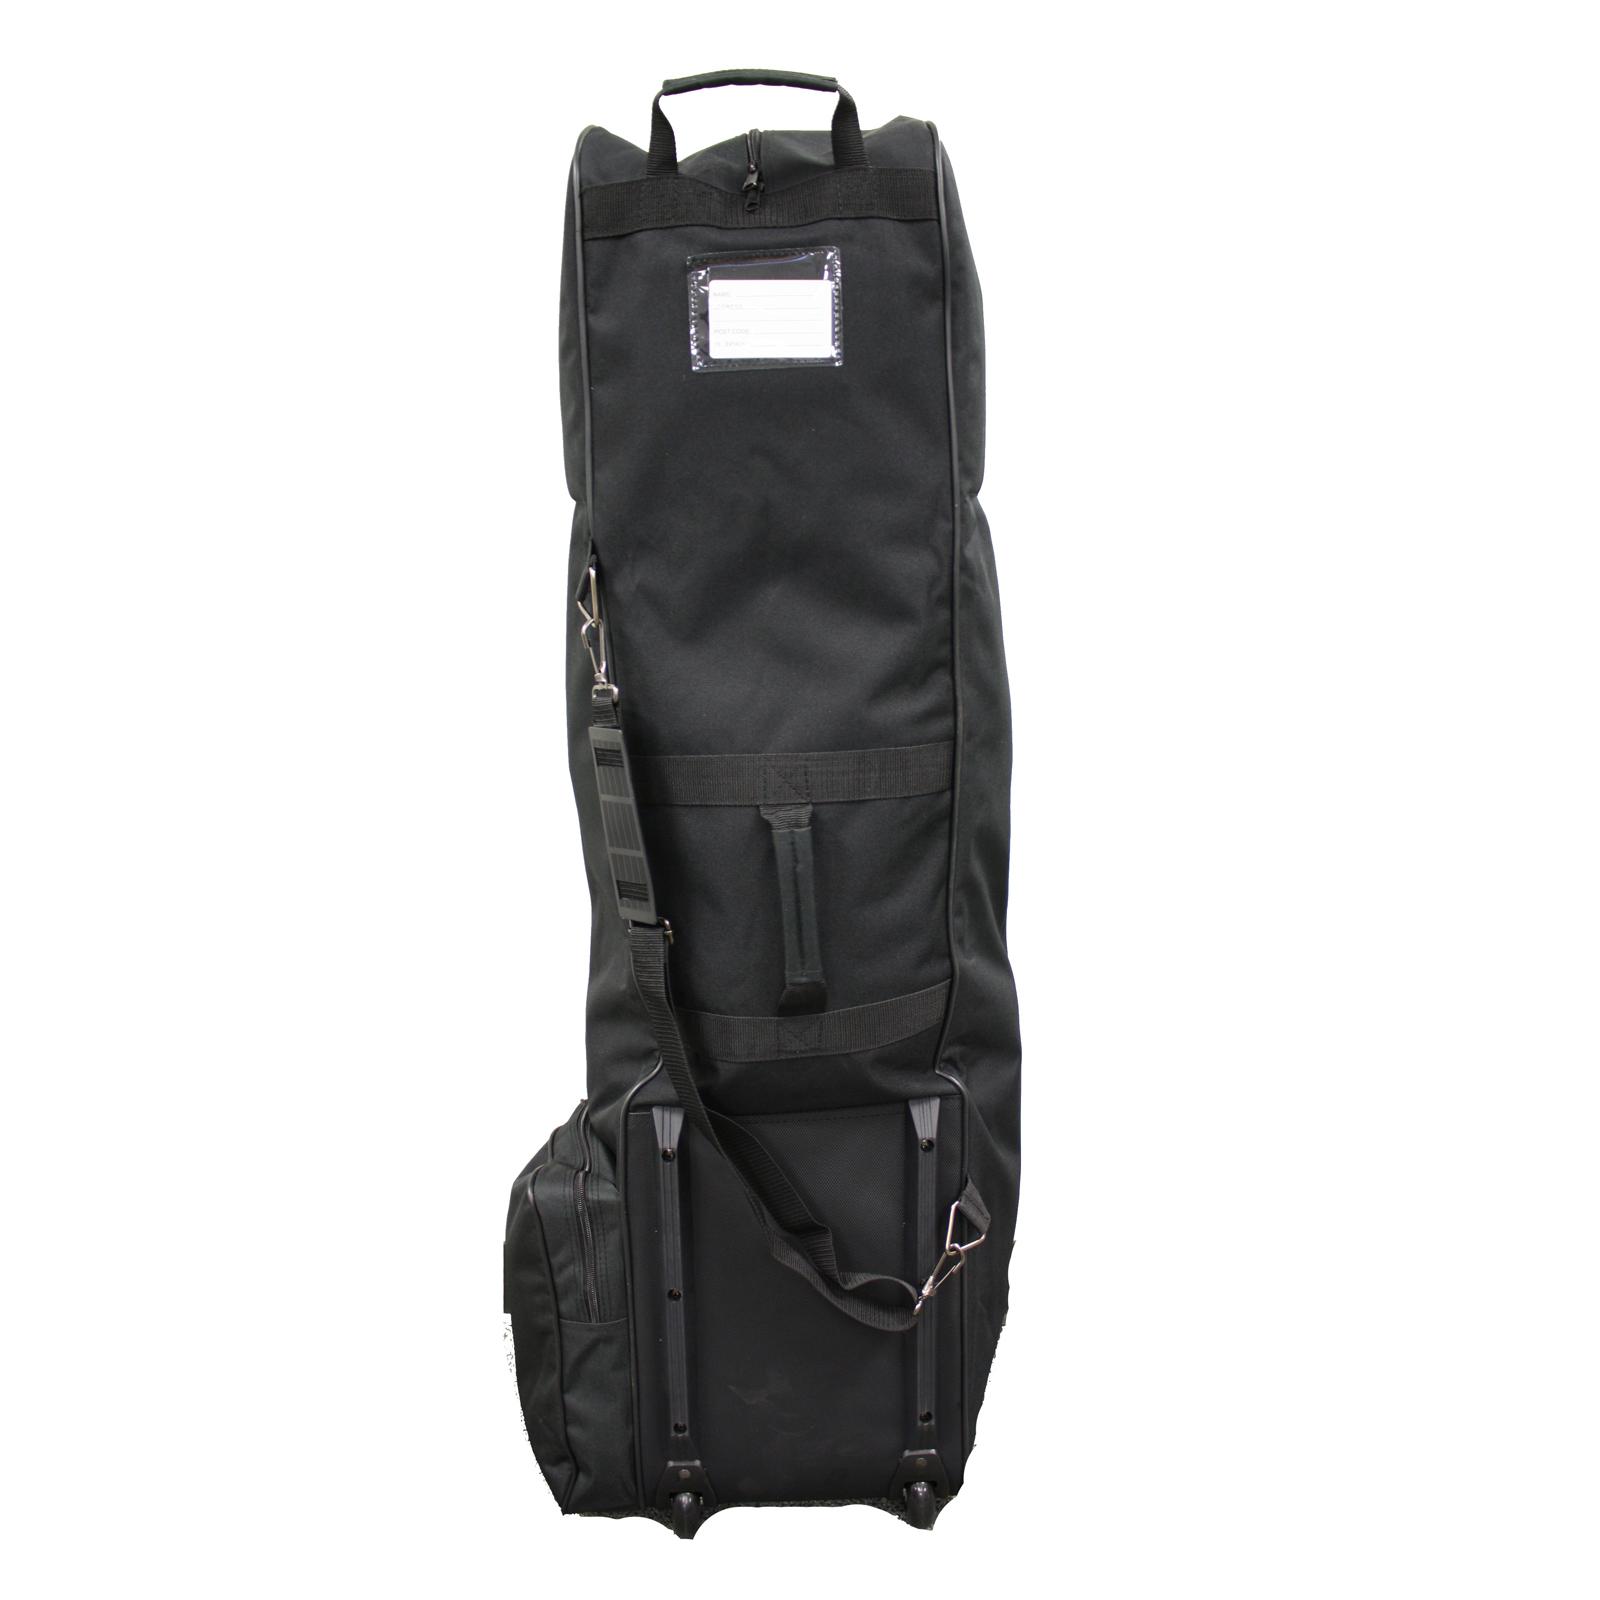 Ec 9717 Golf Travel Bag